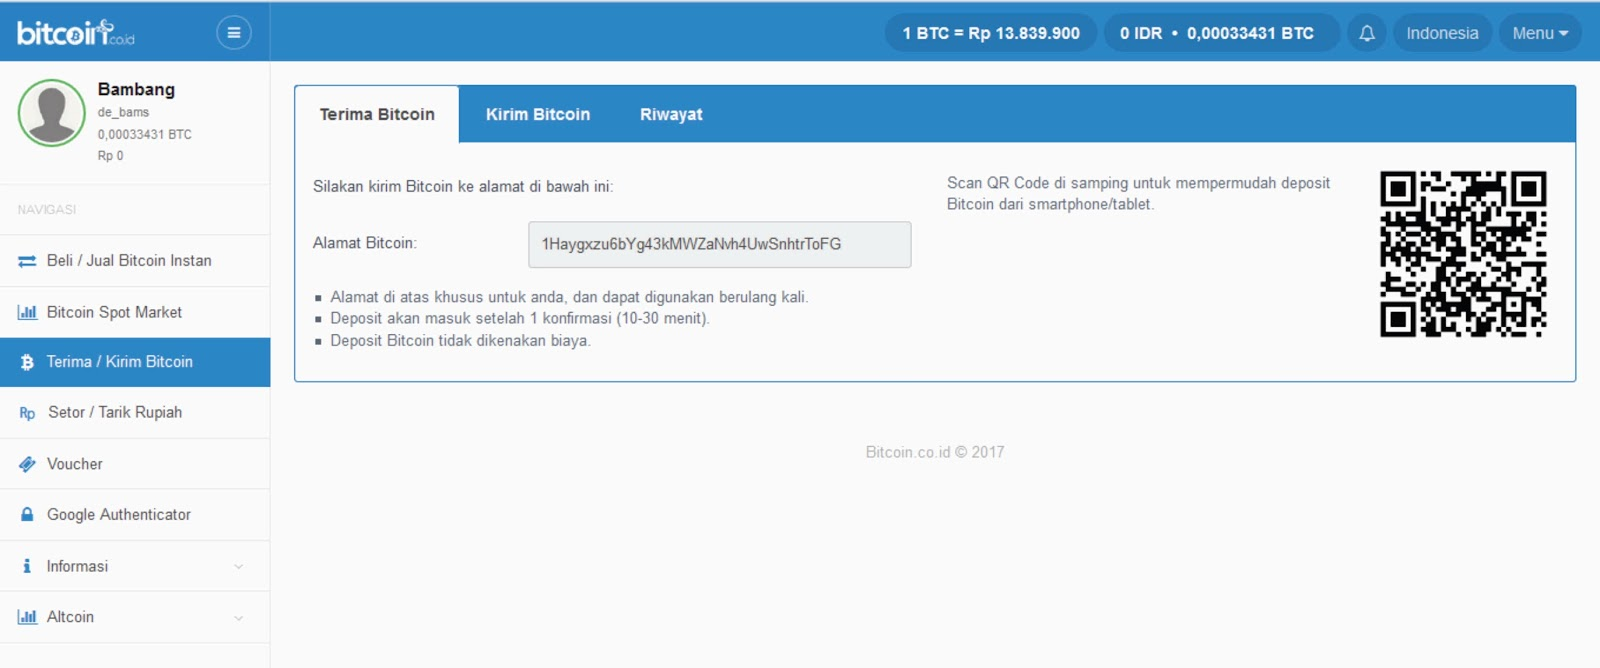 Ruang Ilmu: Cara Mudah Bikin Wallet Virtual dengan Bitcoin.co.id Indonesia